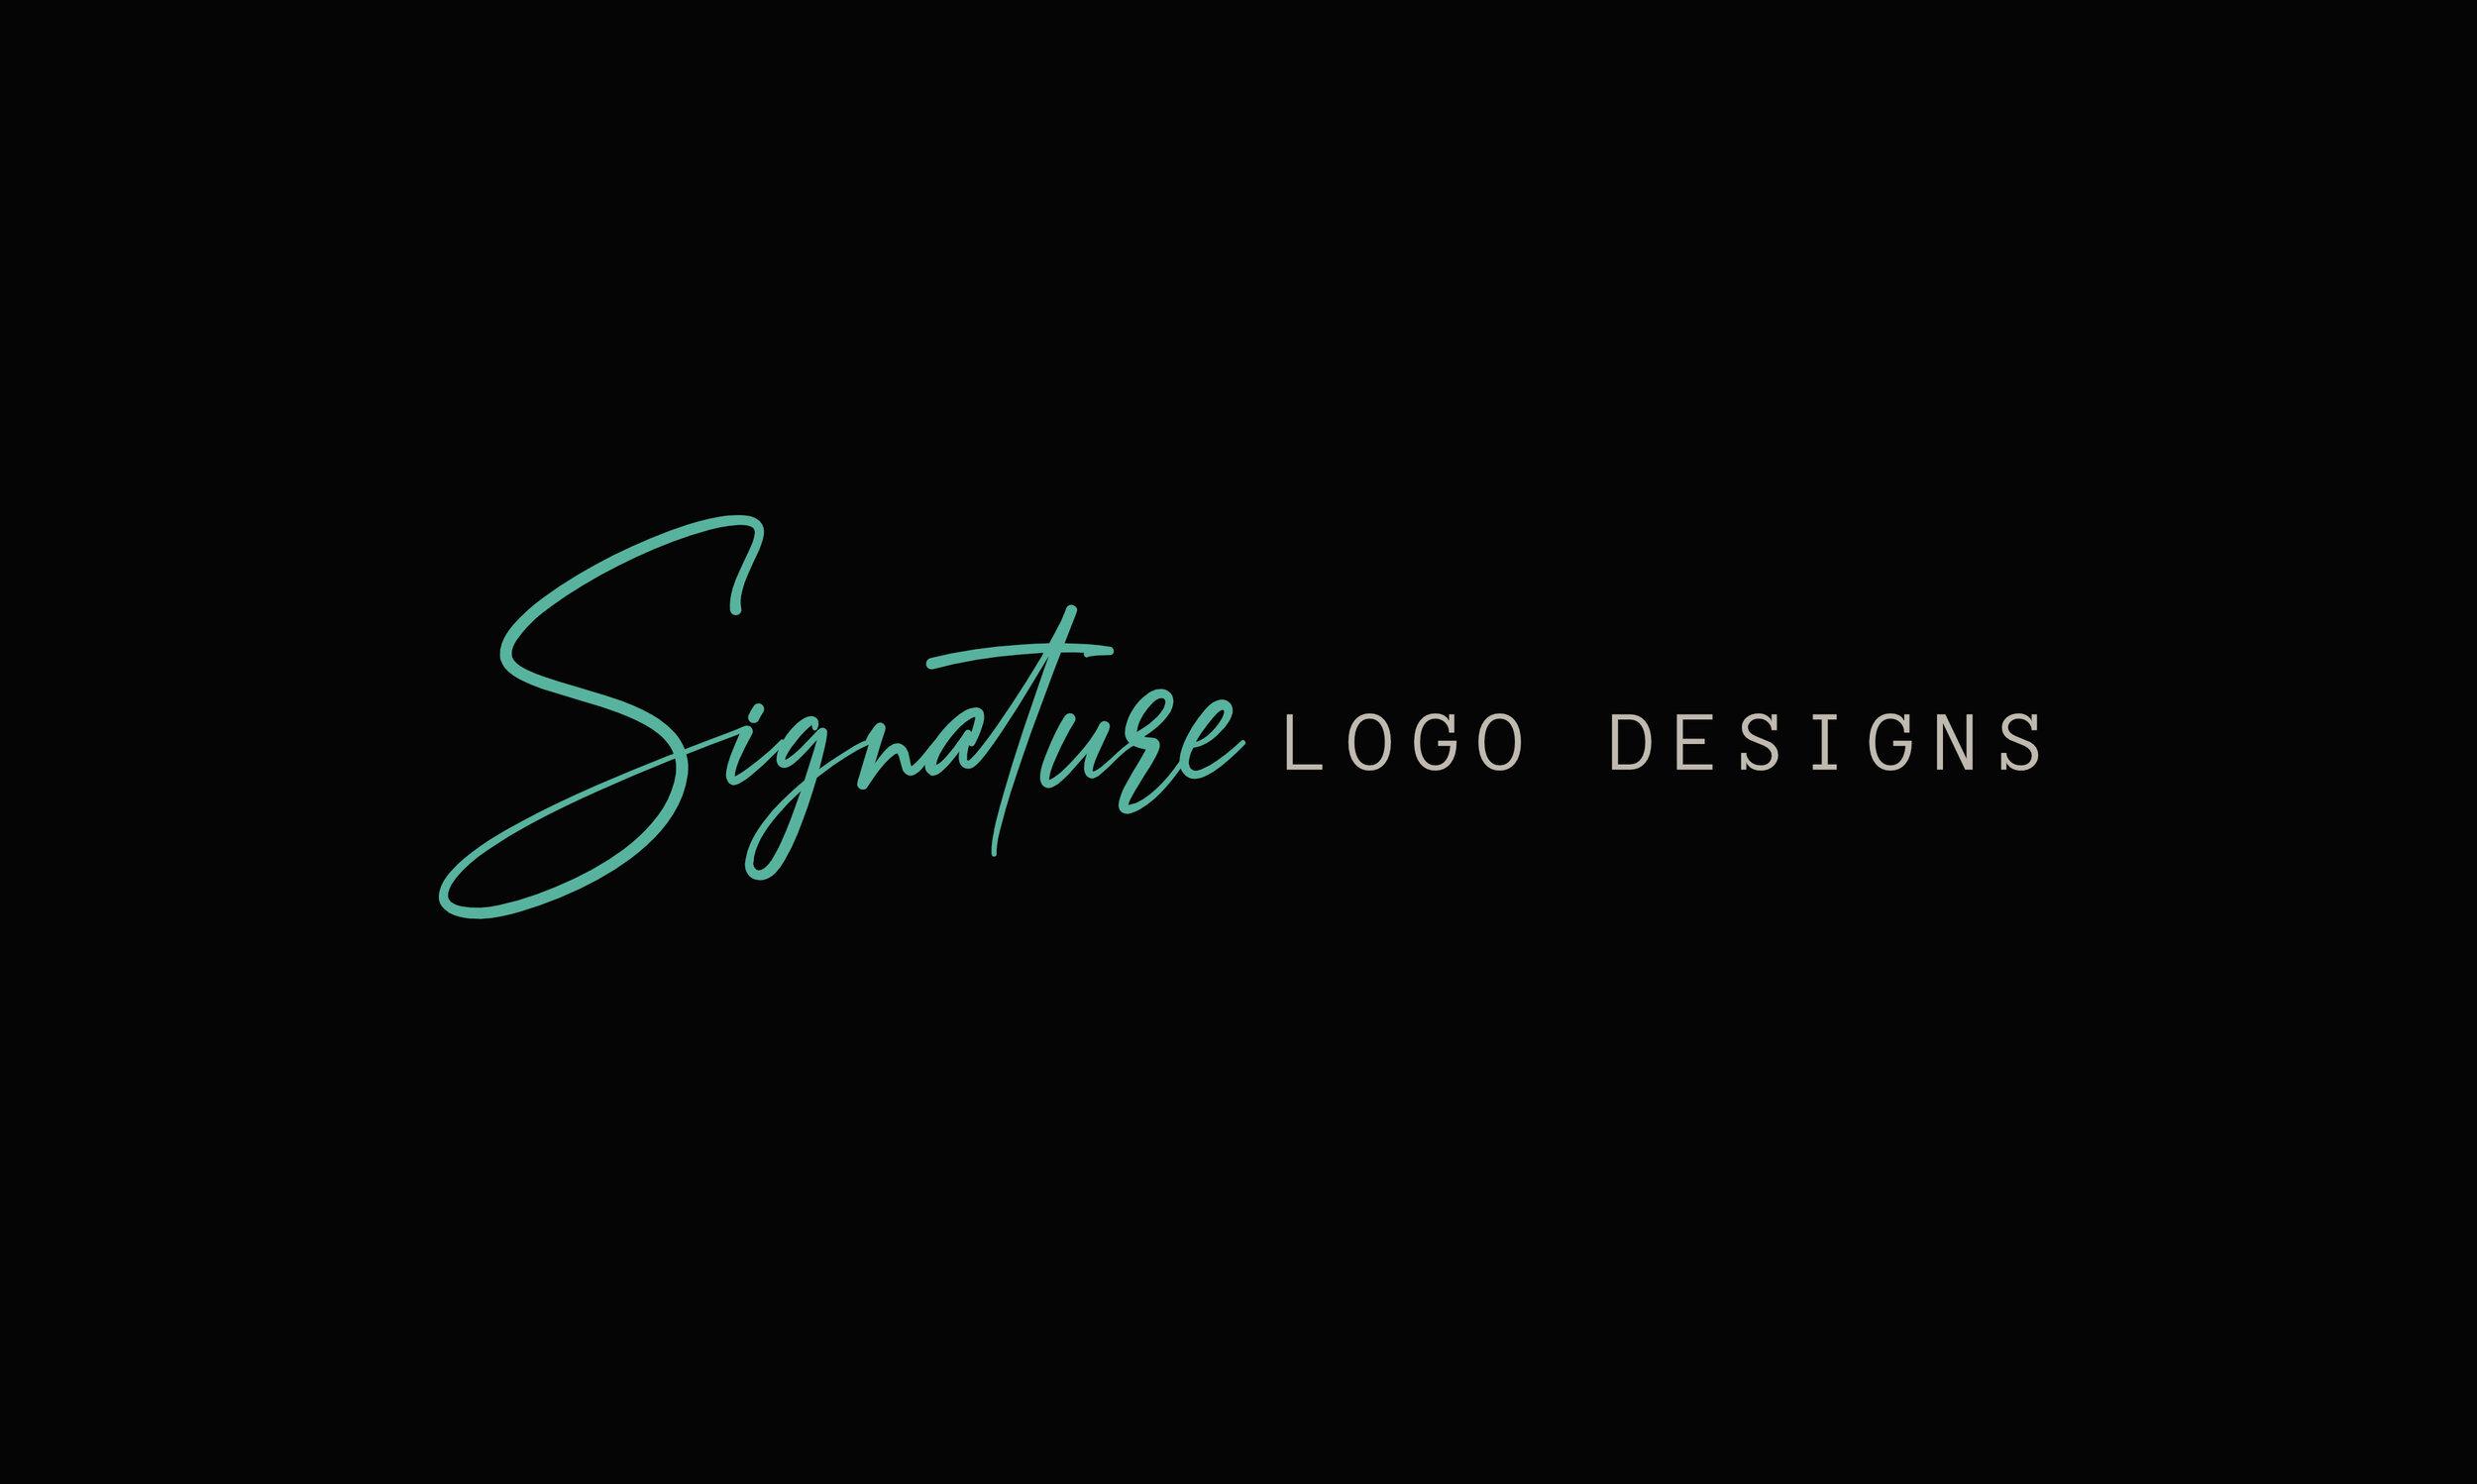 Signature - Behance Cover.jpg